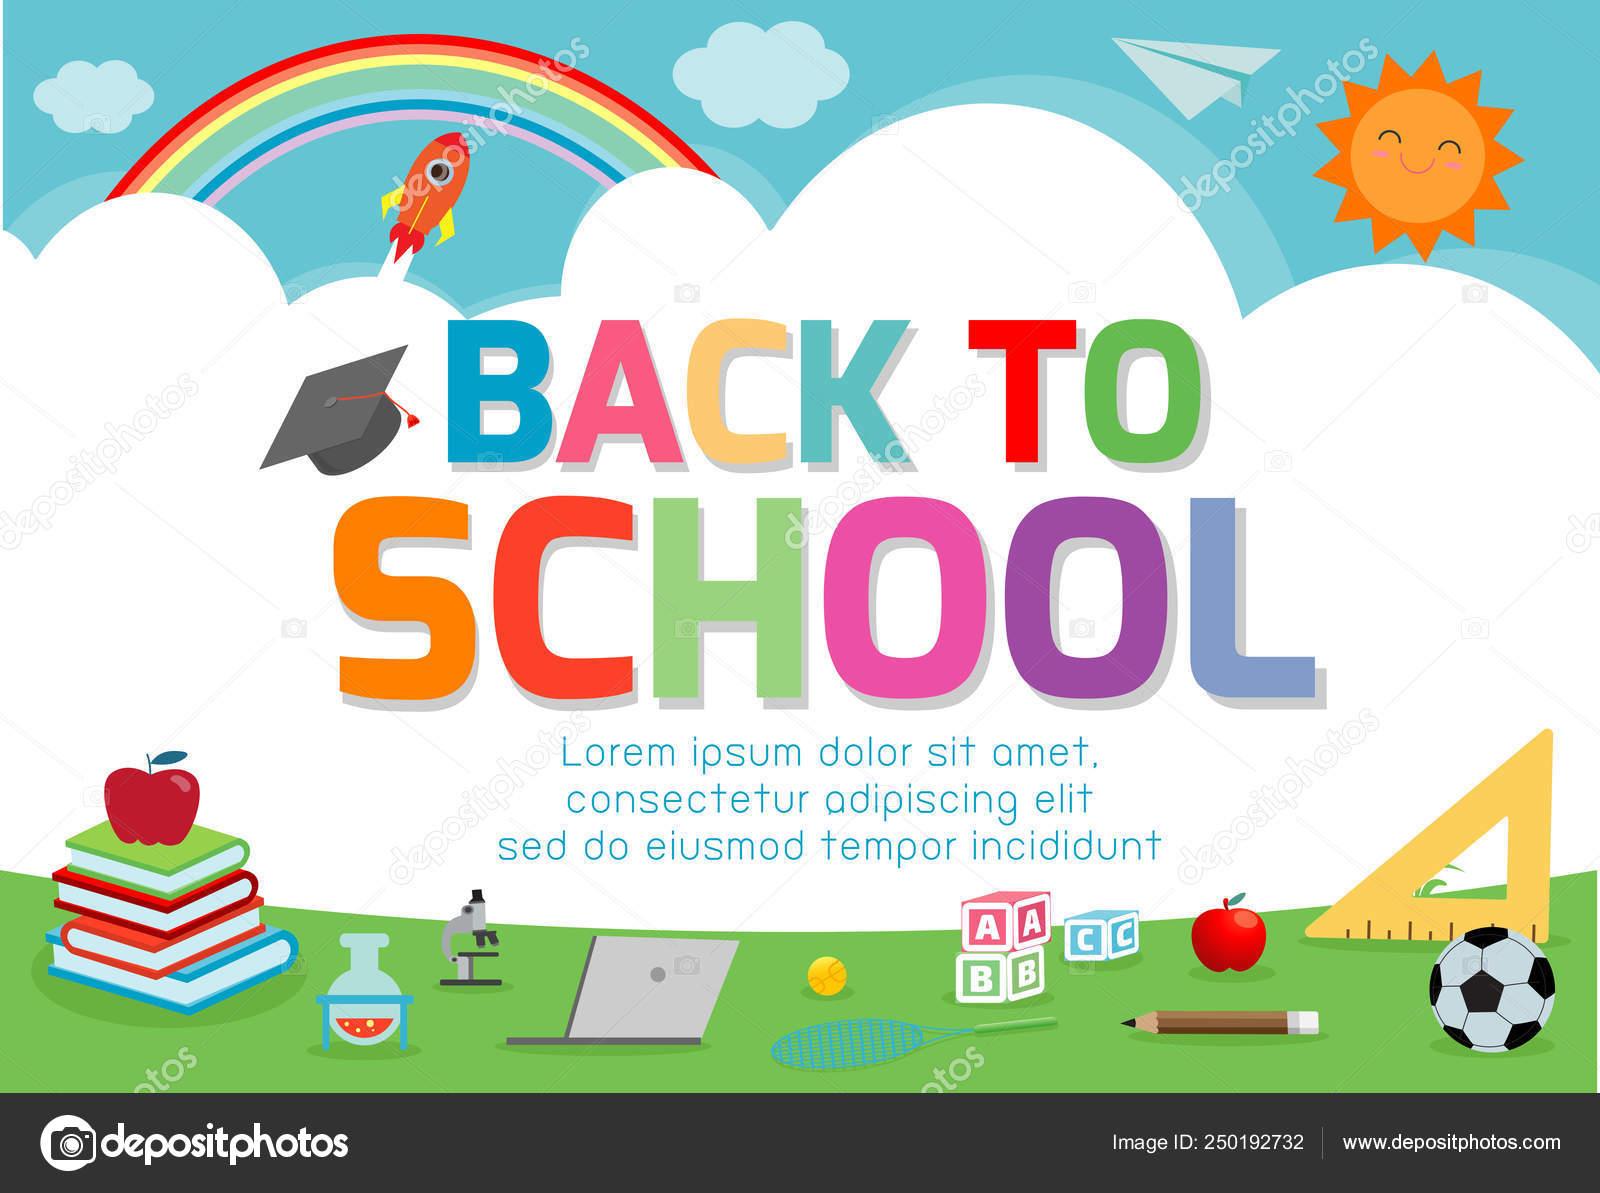 Back School Banner Background Welcome Back School Cute School Kids Stock Vector C Phanuchat10700 Gmail Com 250192732